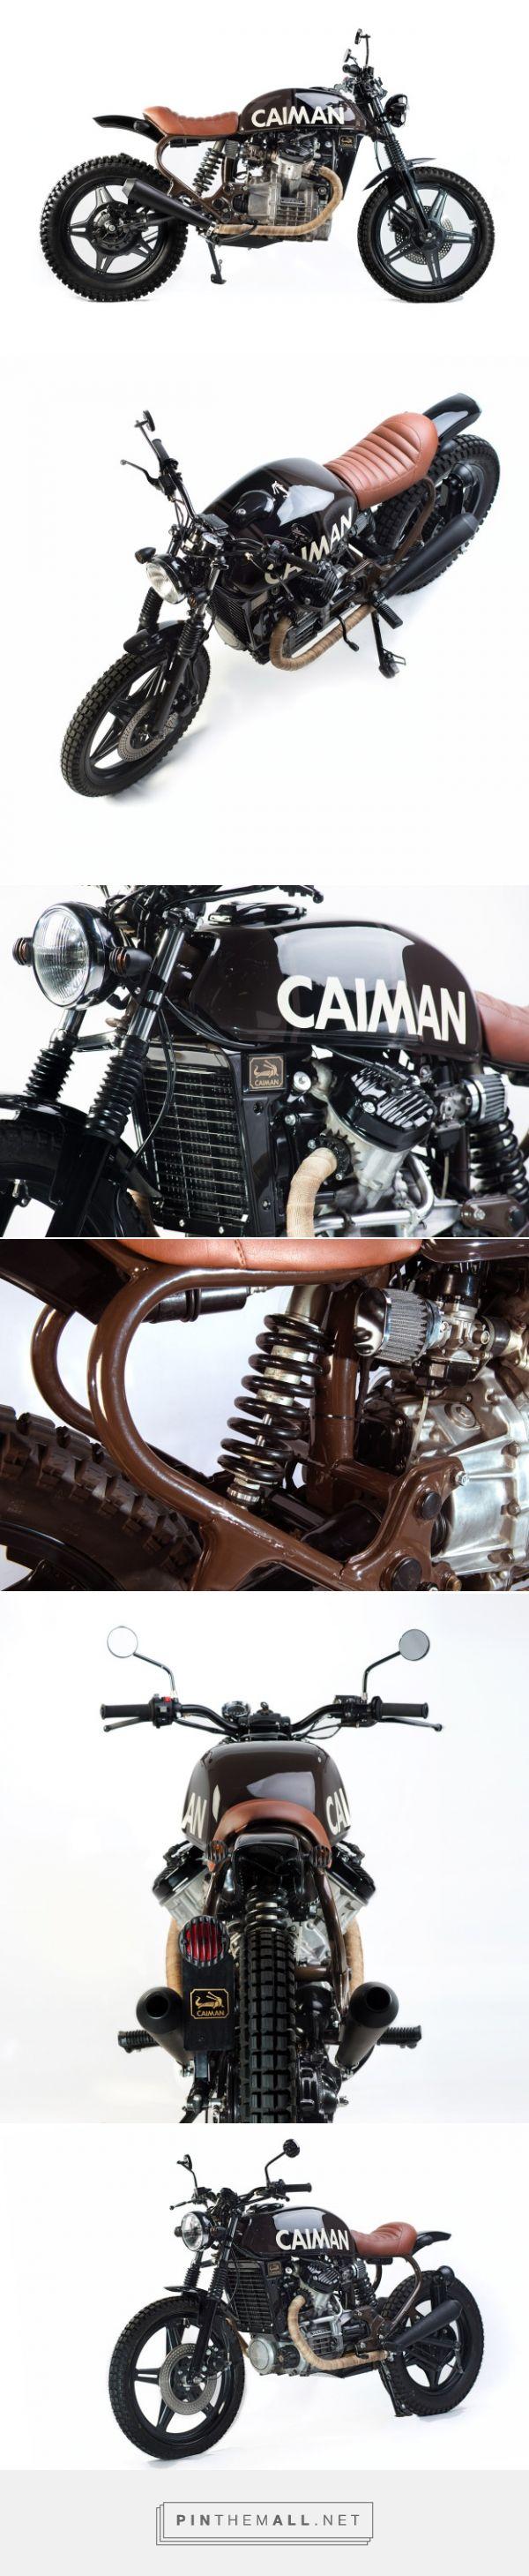 Urban Scrambler: Caiman's Honda CX500 | Bike EXIF